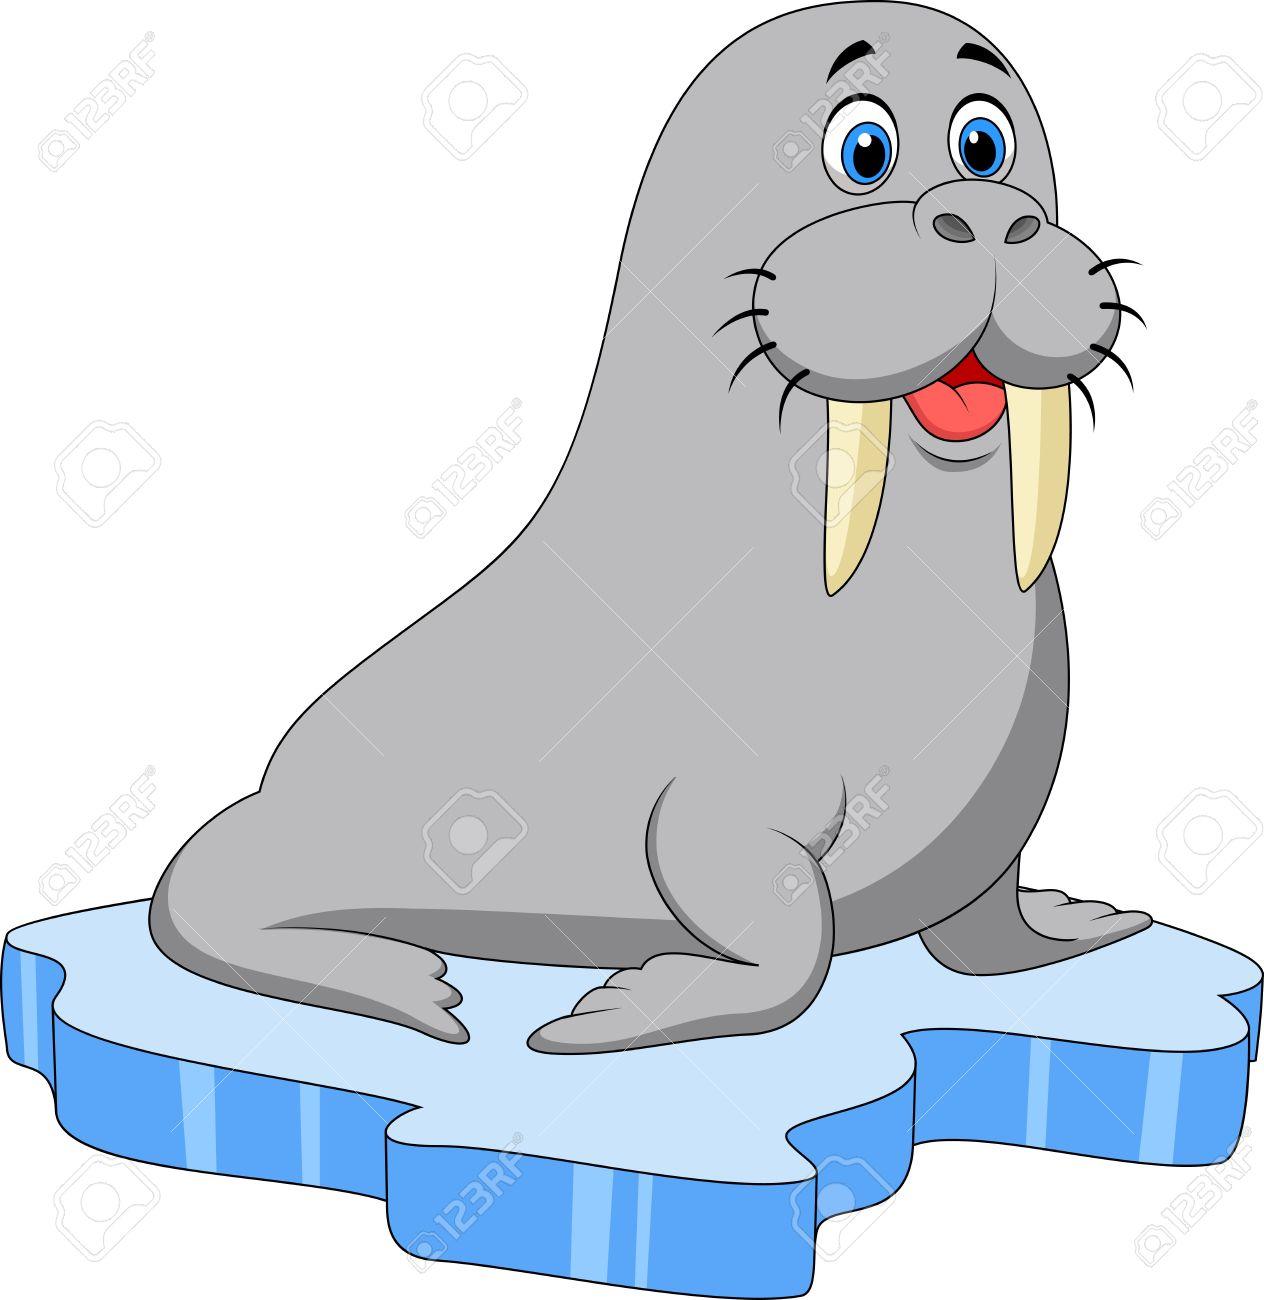 Grey clipart walrus #4 - Walrus Clipart